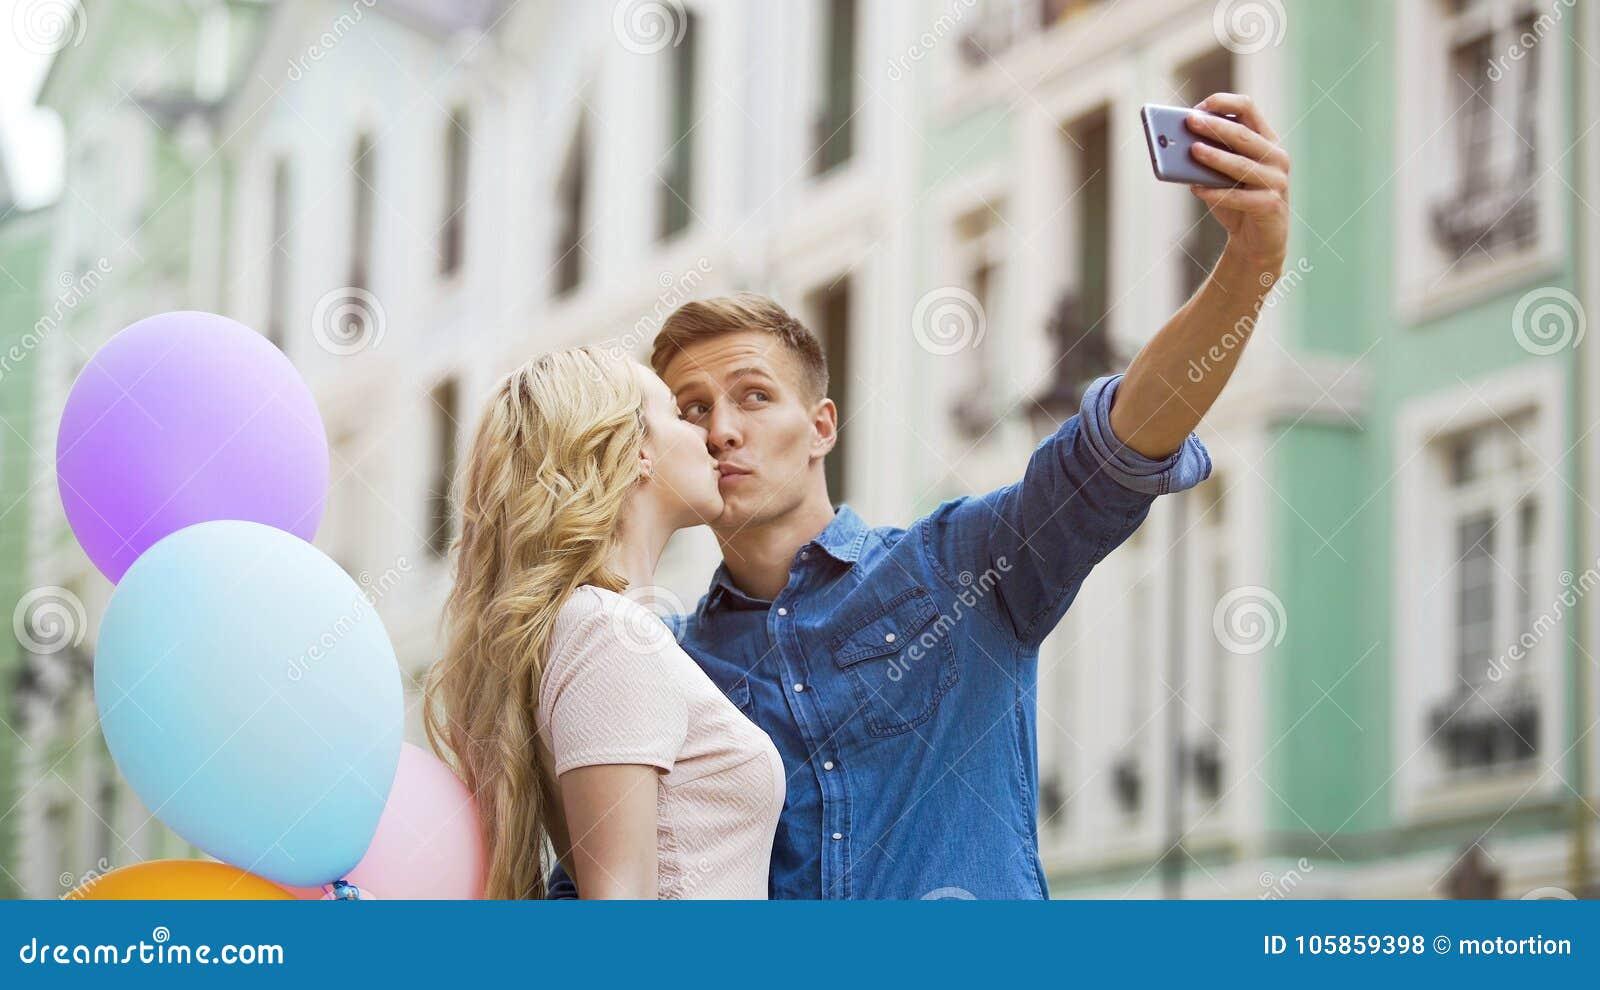 gratis dating sites Hyderabad